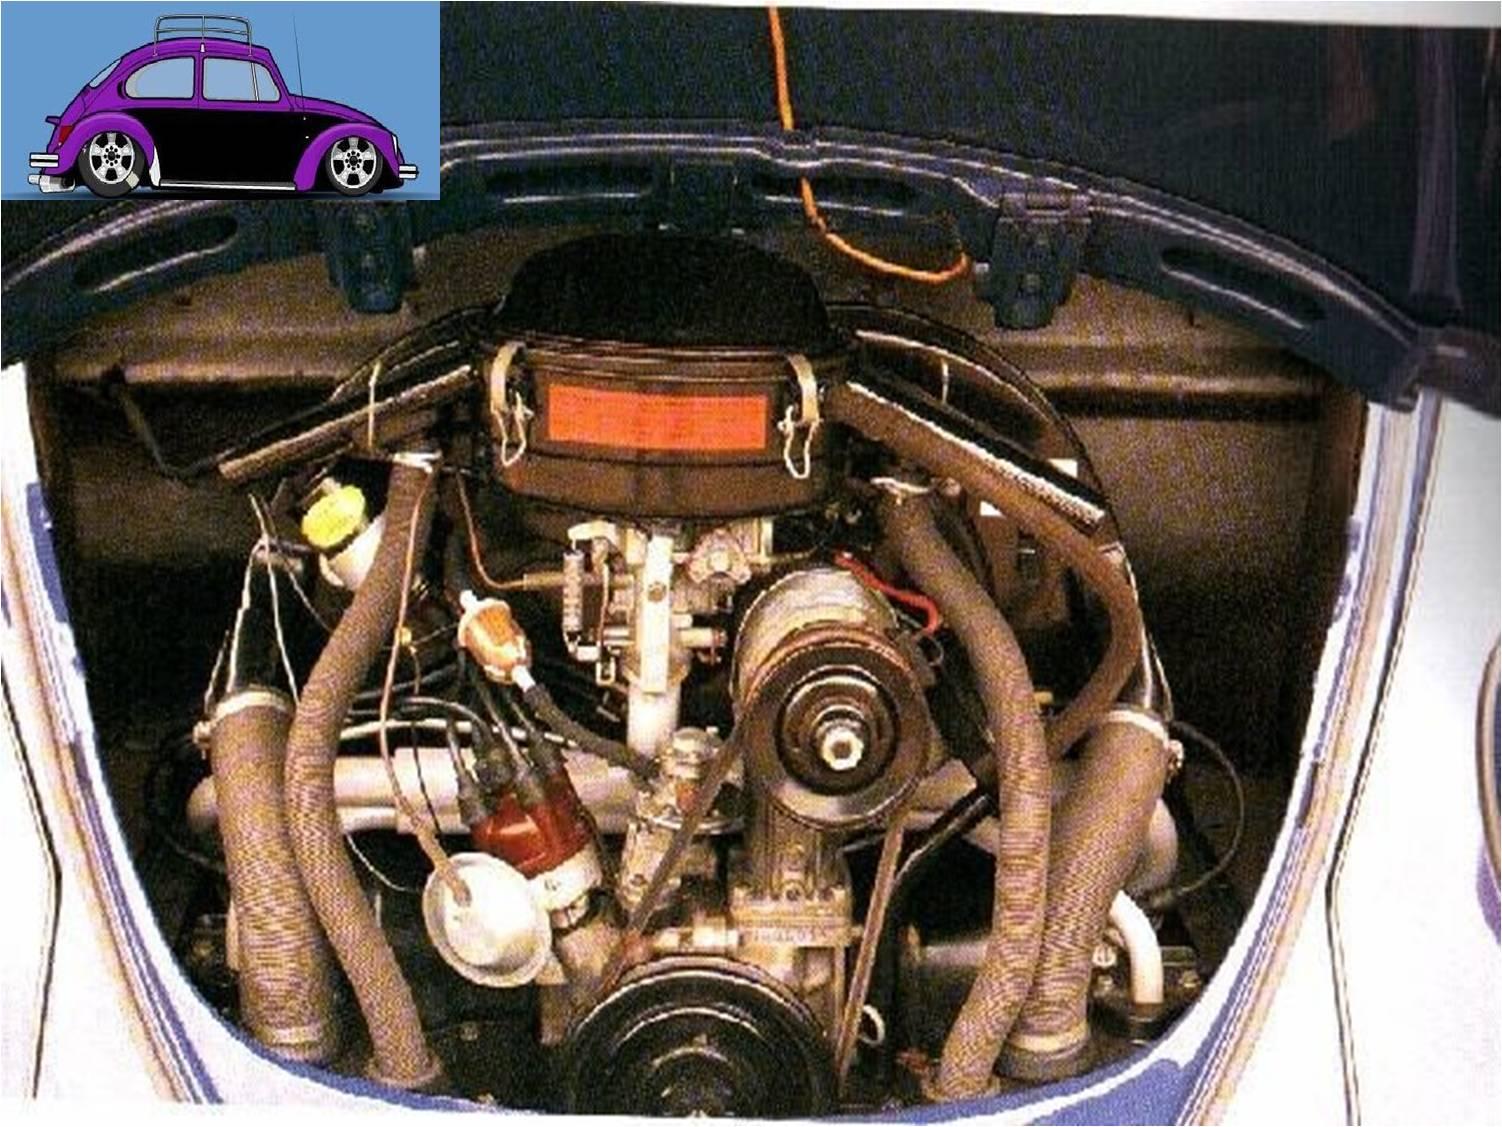 Motor Vw 1500 >> Georgevochos Motor 1500 Vw